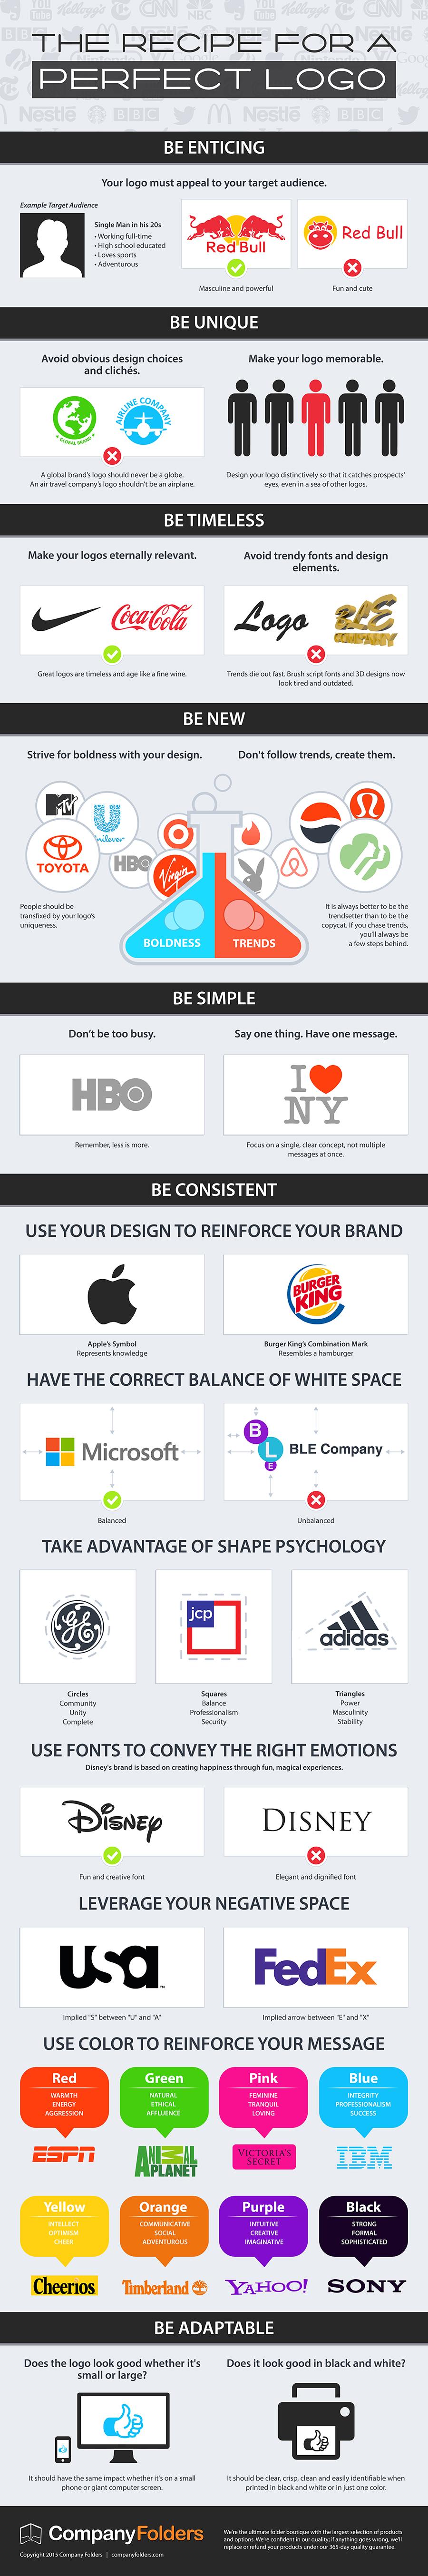 Perfect Logo Design Infographic